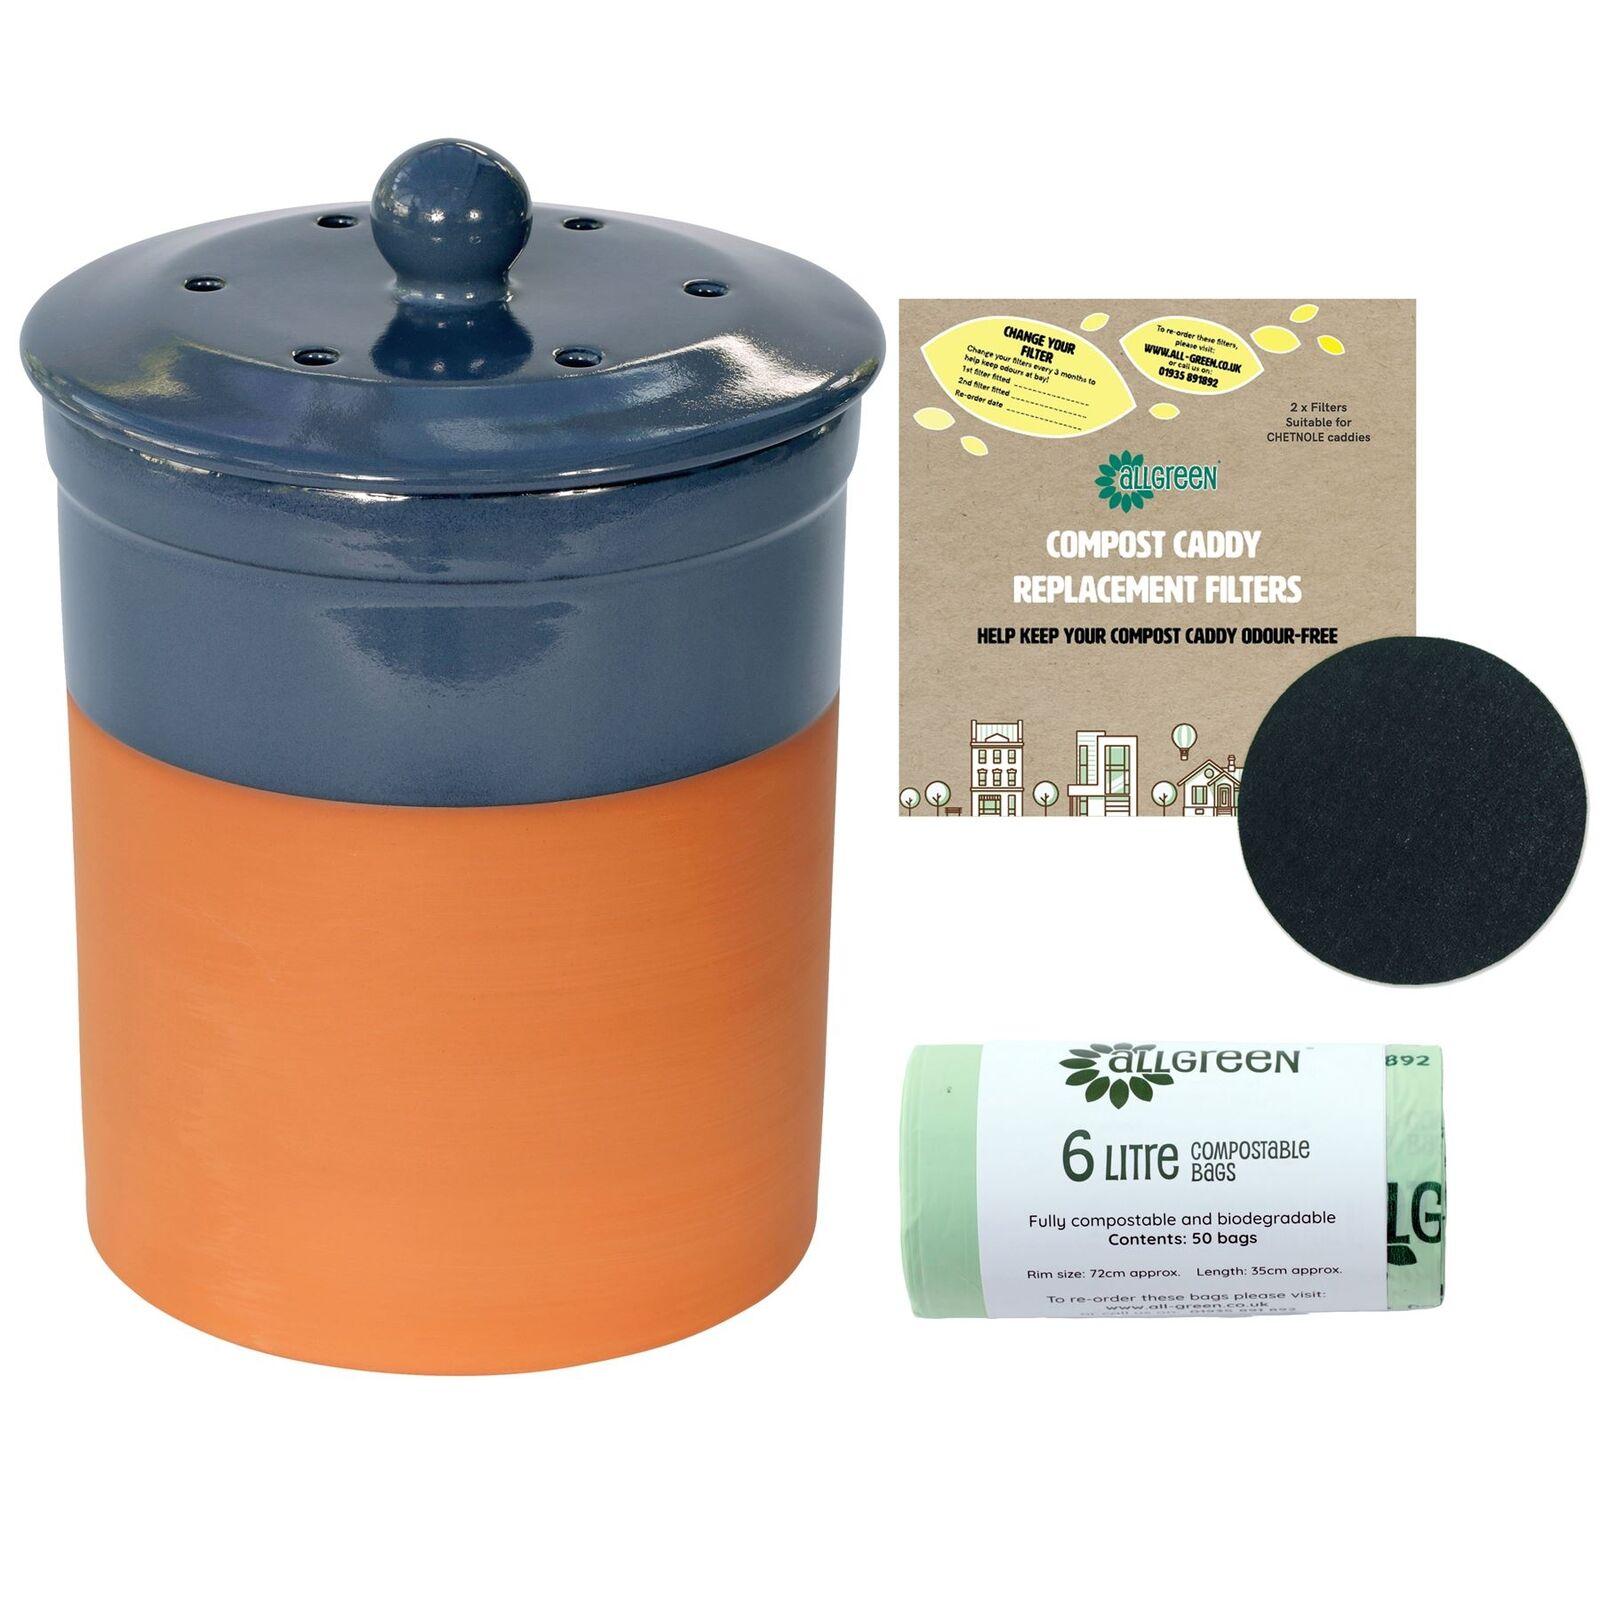 Chetnole Terracotta Ceramic Caddy-Blau-2xFilters&50x6L Compostable Bags